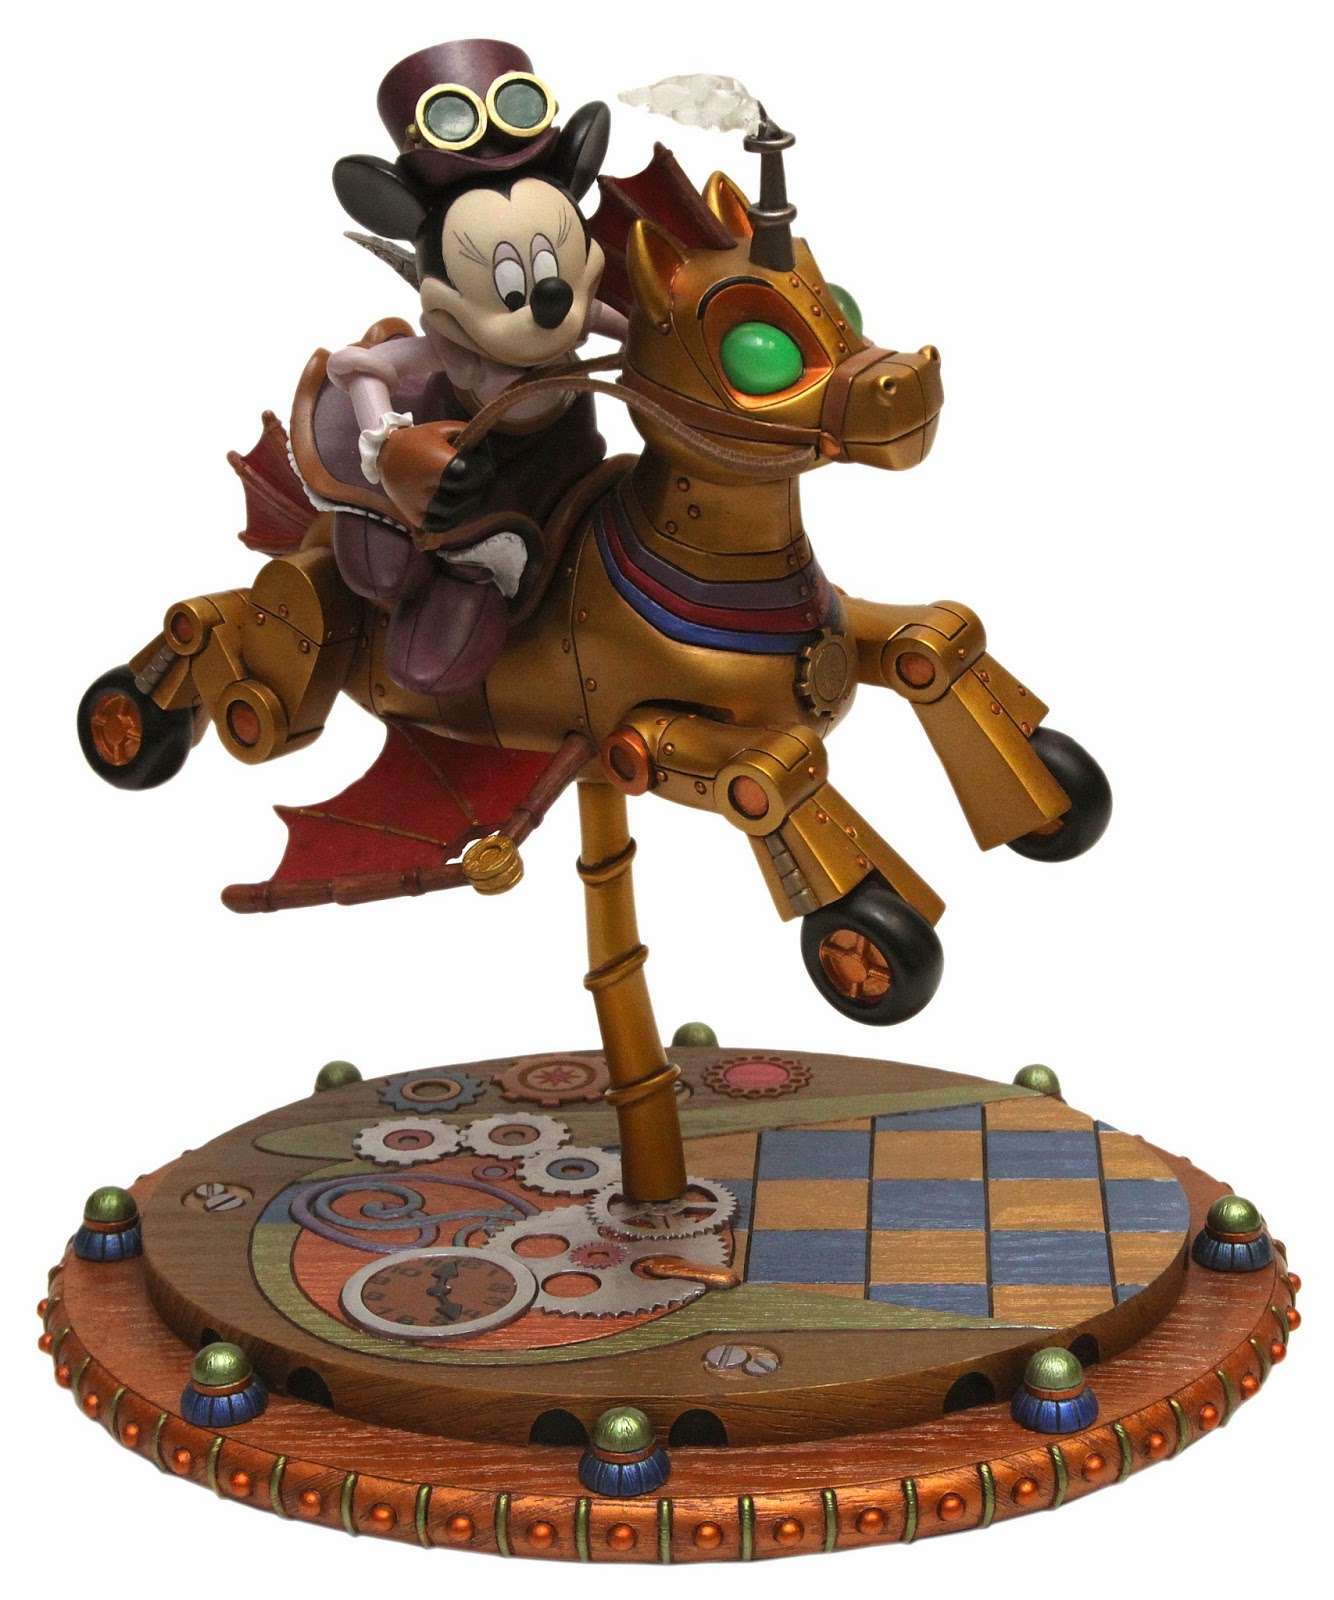 Minnie Mouse Mechanical Kingdom Gears Figure Figurine Statues Carousel Horse Steamunk Walt Disney World WDW Disneyland